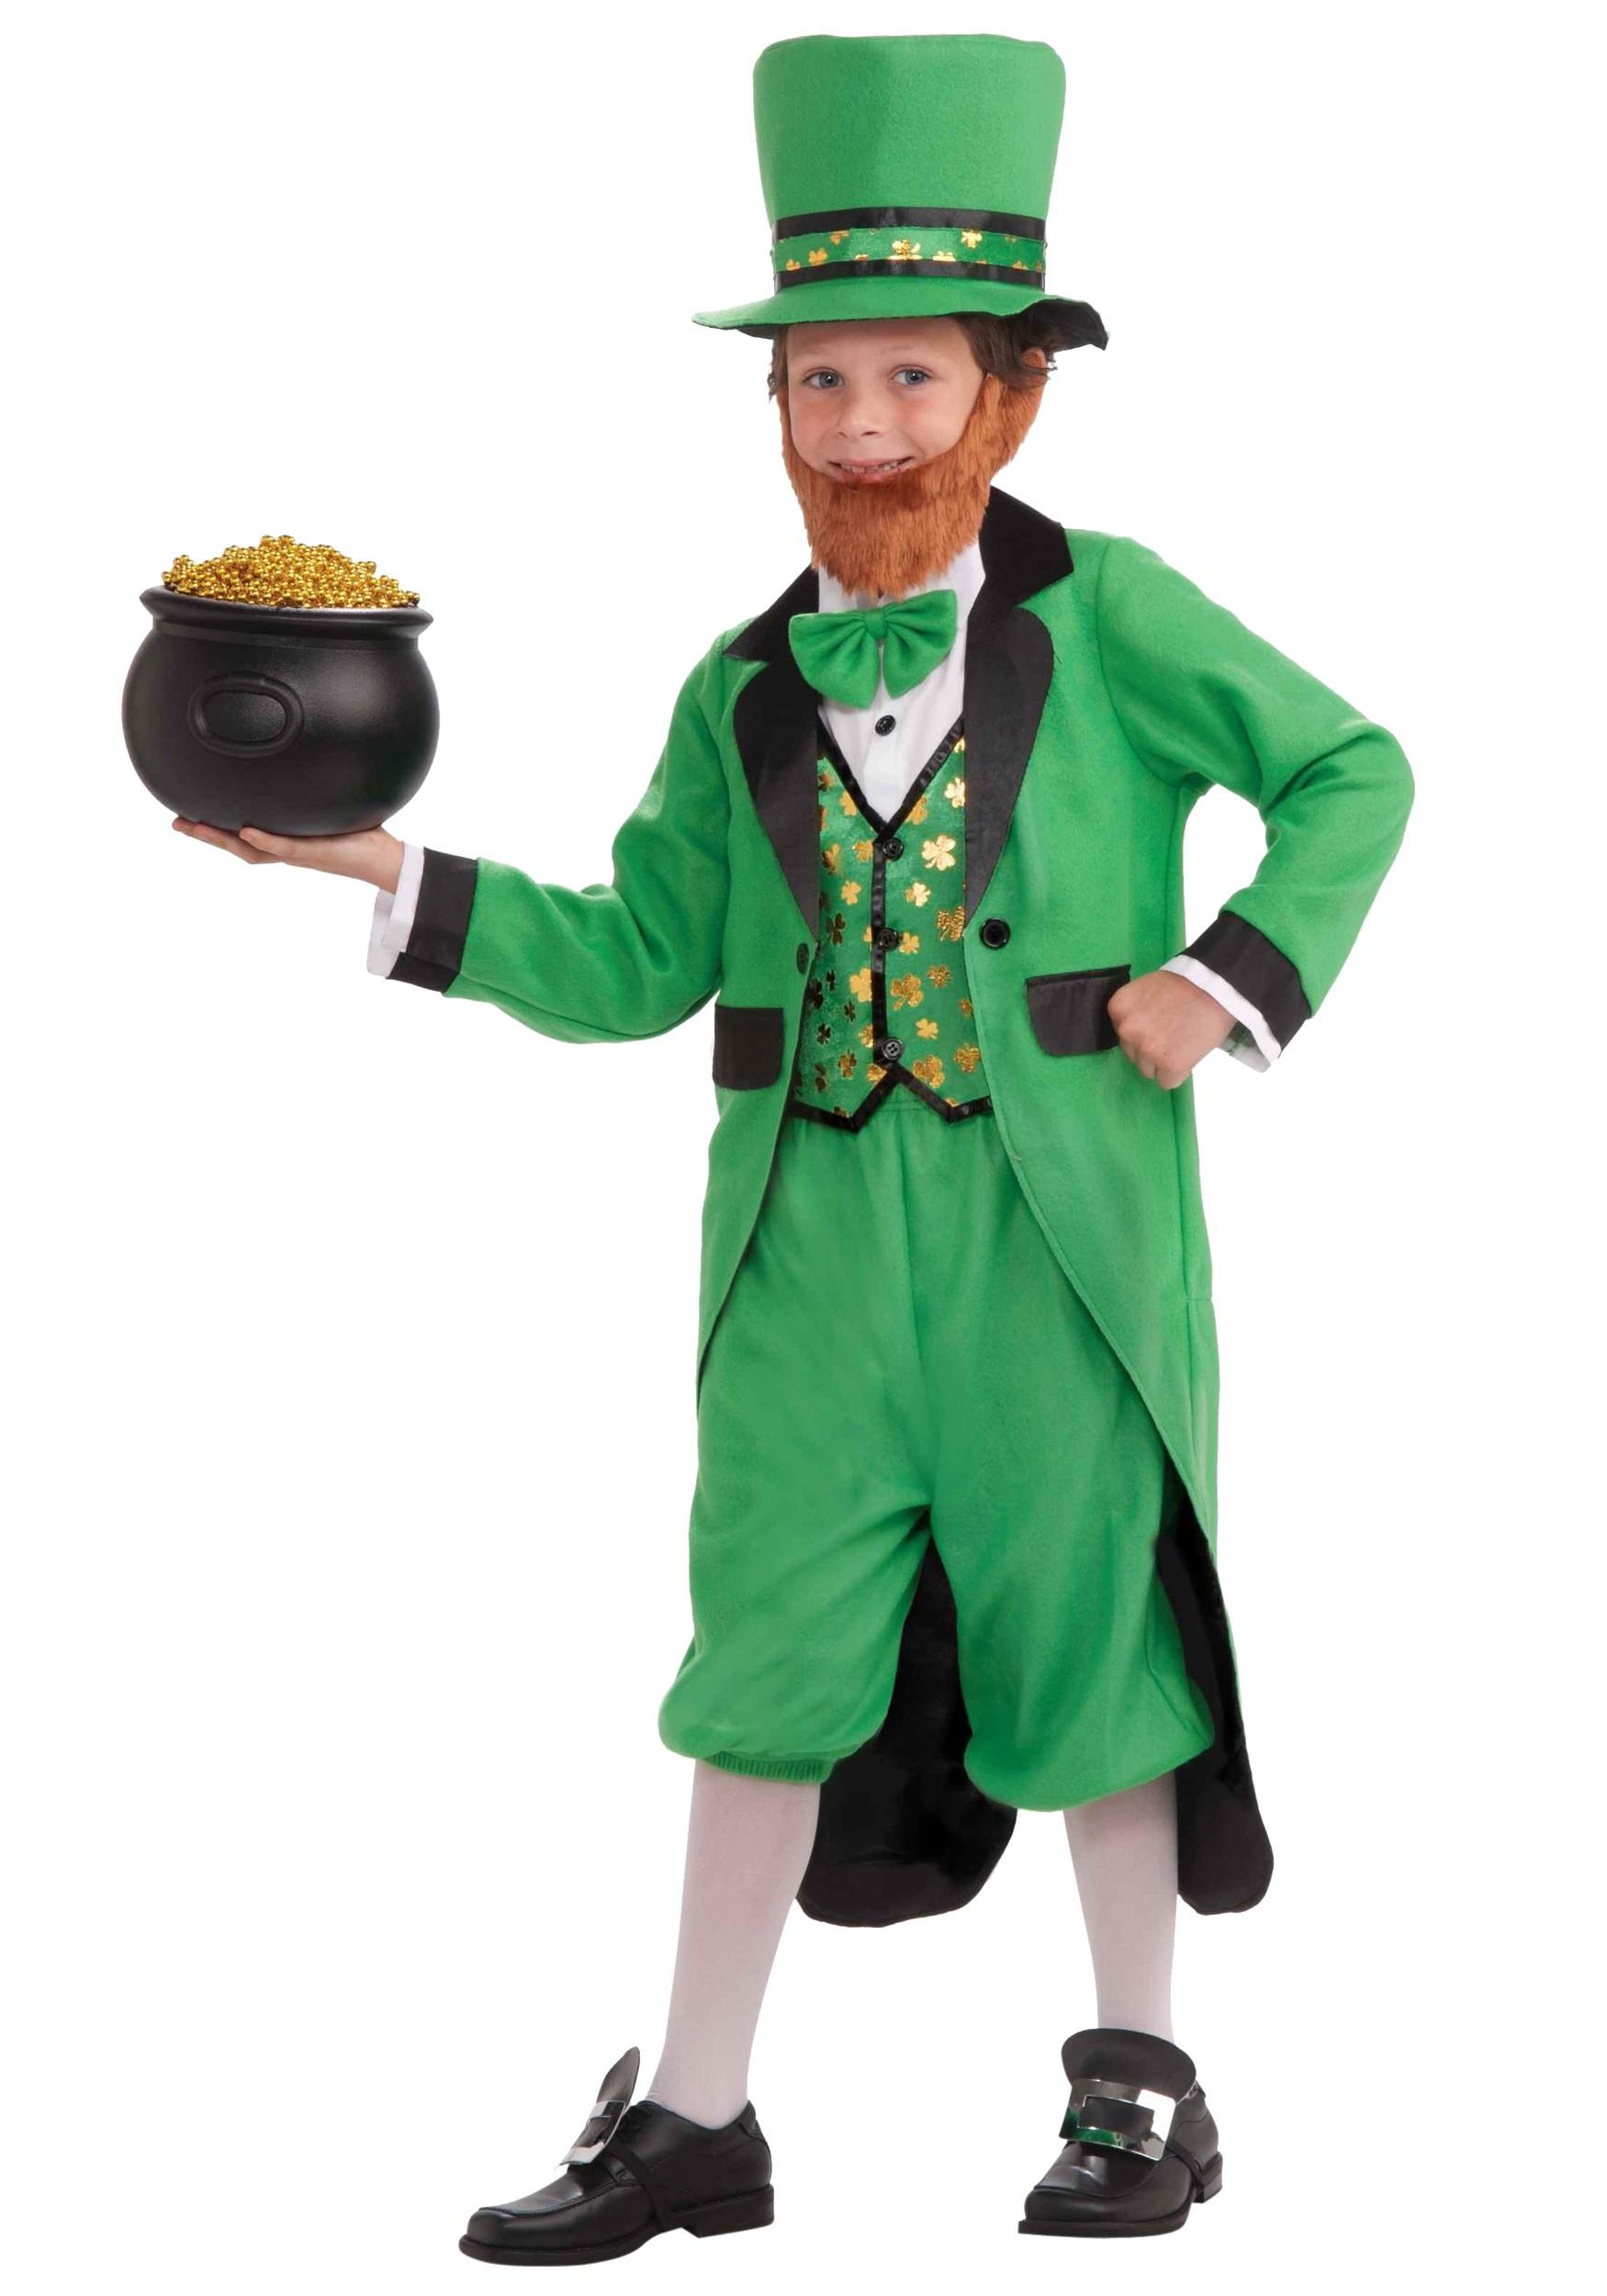 Kids Lucky Leprechaun Costume  sc 1 st  Halloween Costume & Kids Lucky Leprechaun Costume- Boys St. Patricks Day Costume Ideas